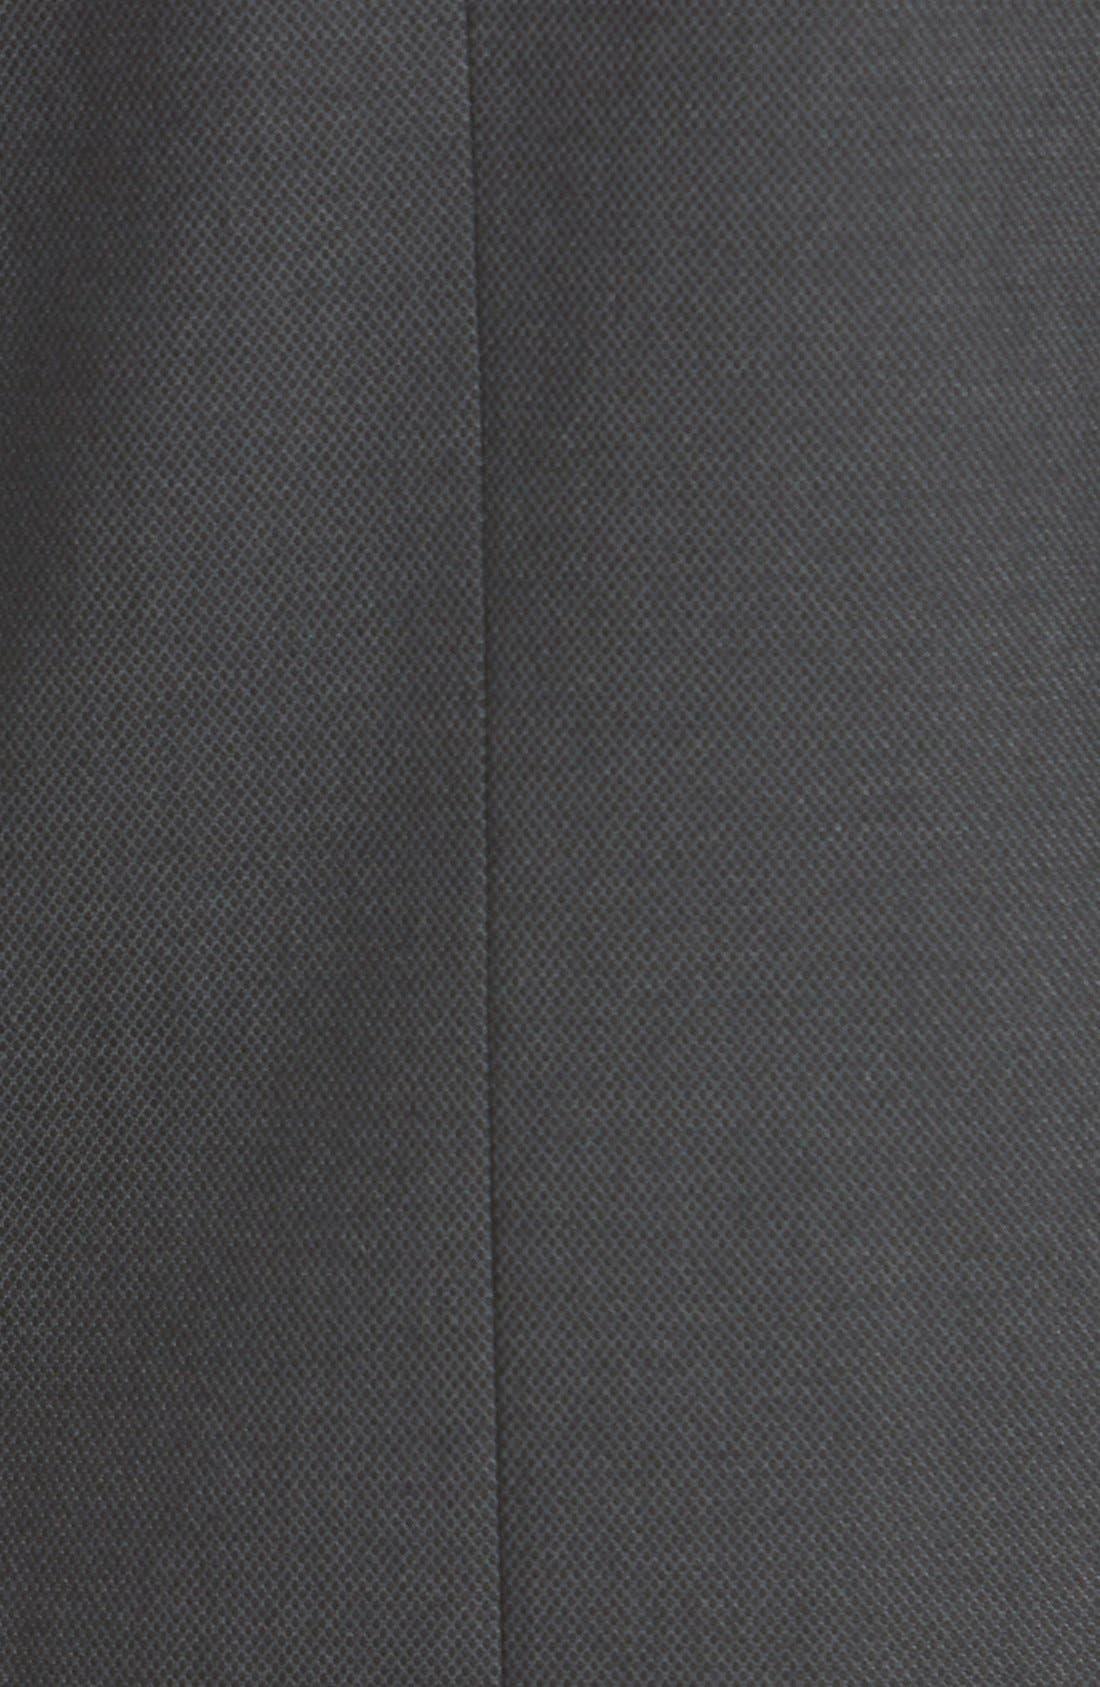 T TAHARI,                             'Carina' Jacket,                             Alternate thumbnail 2, color,                             021